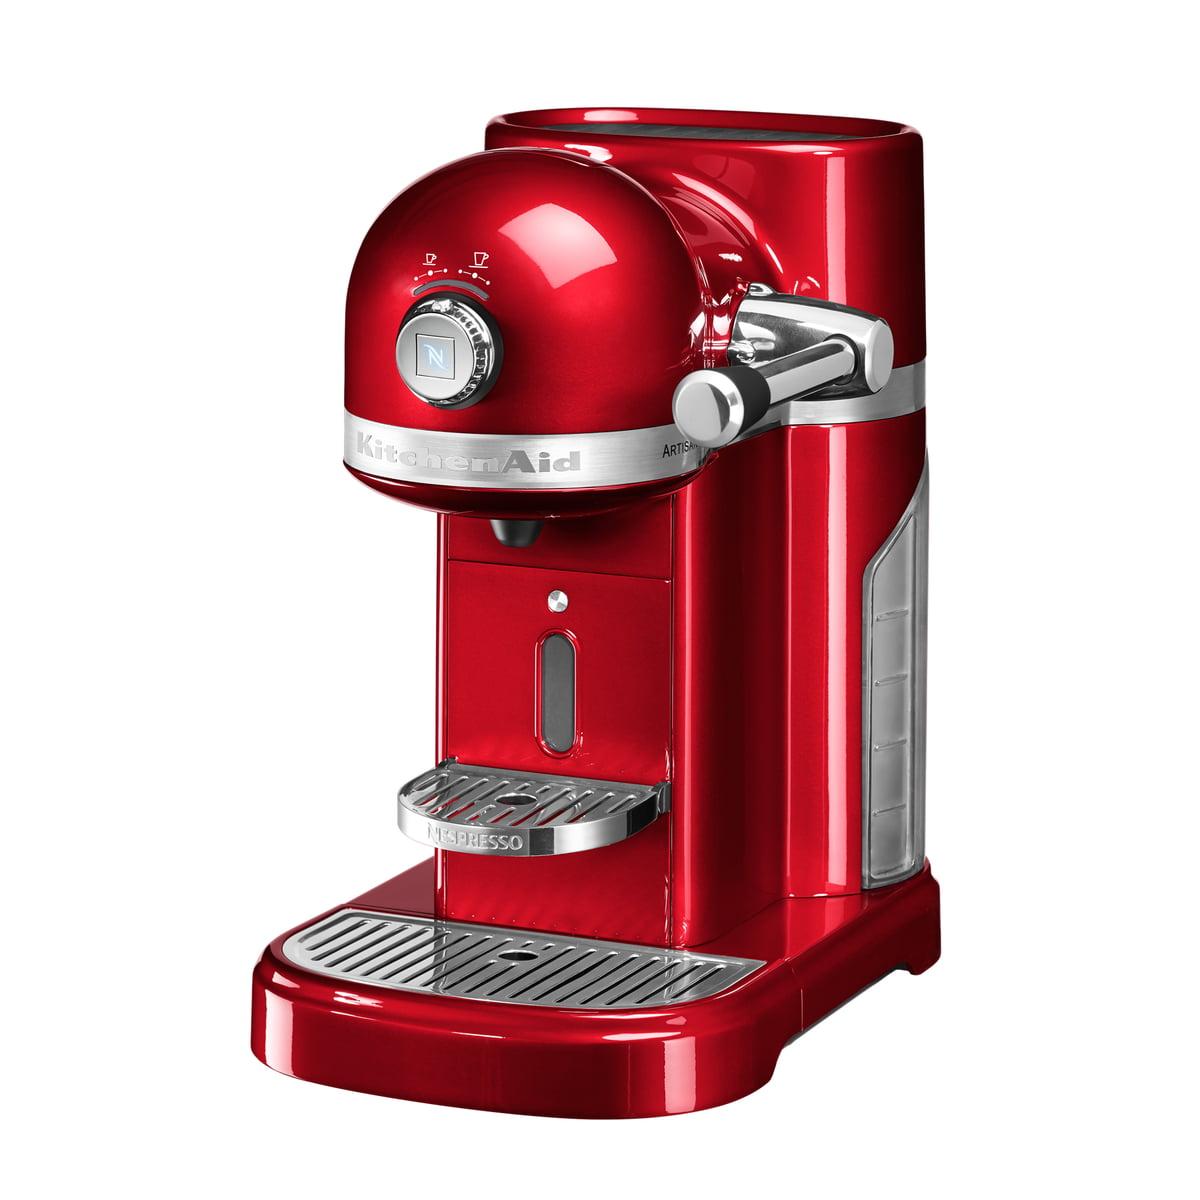 Artisan Nespresso Kaffeemaschine Connox Shop